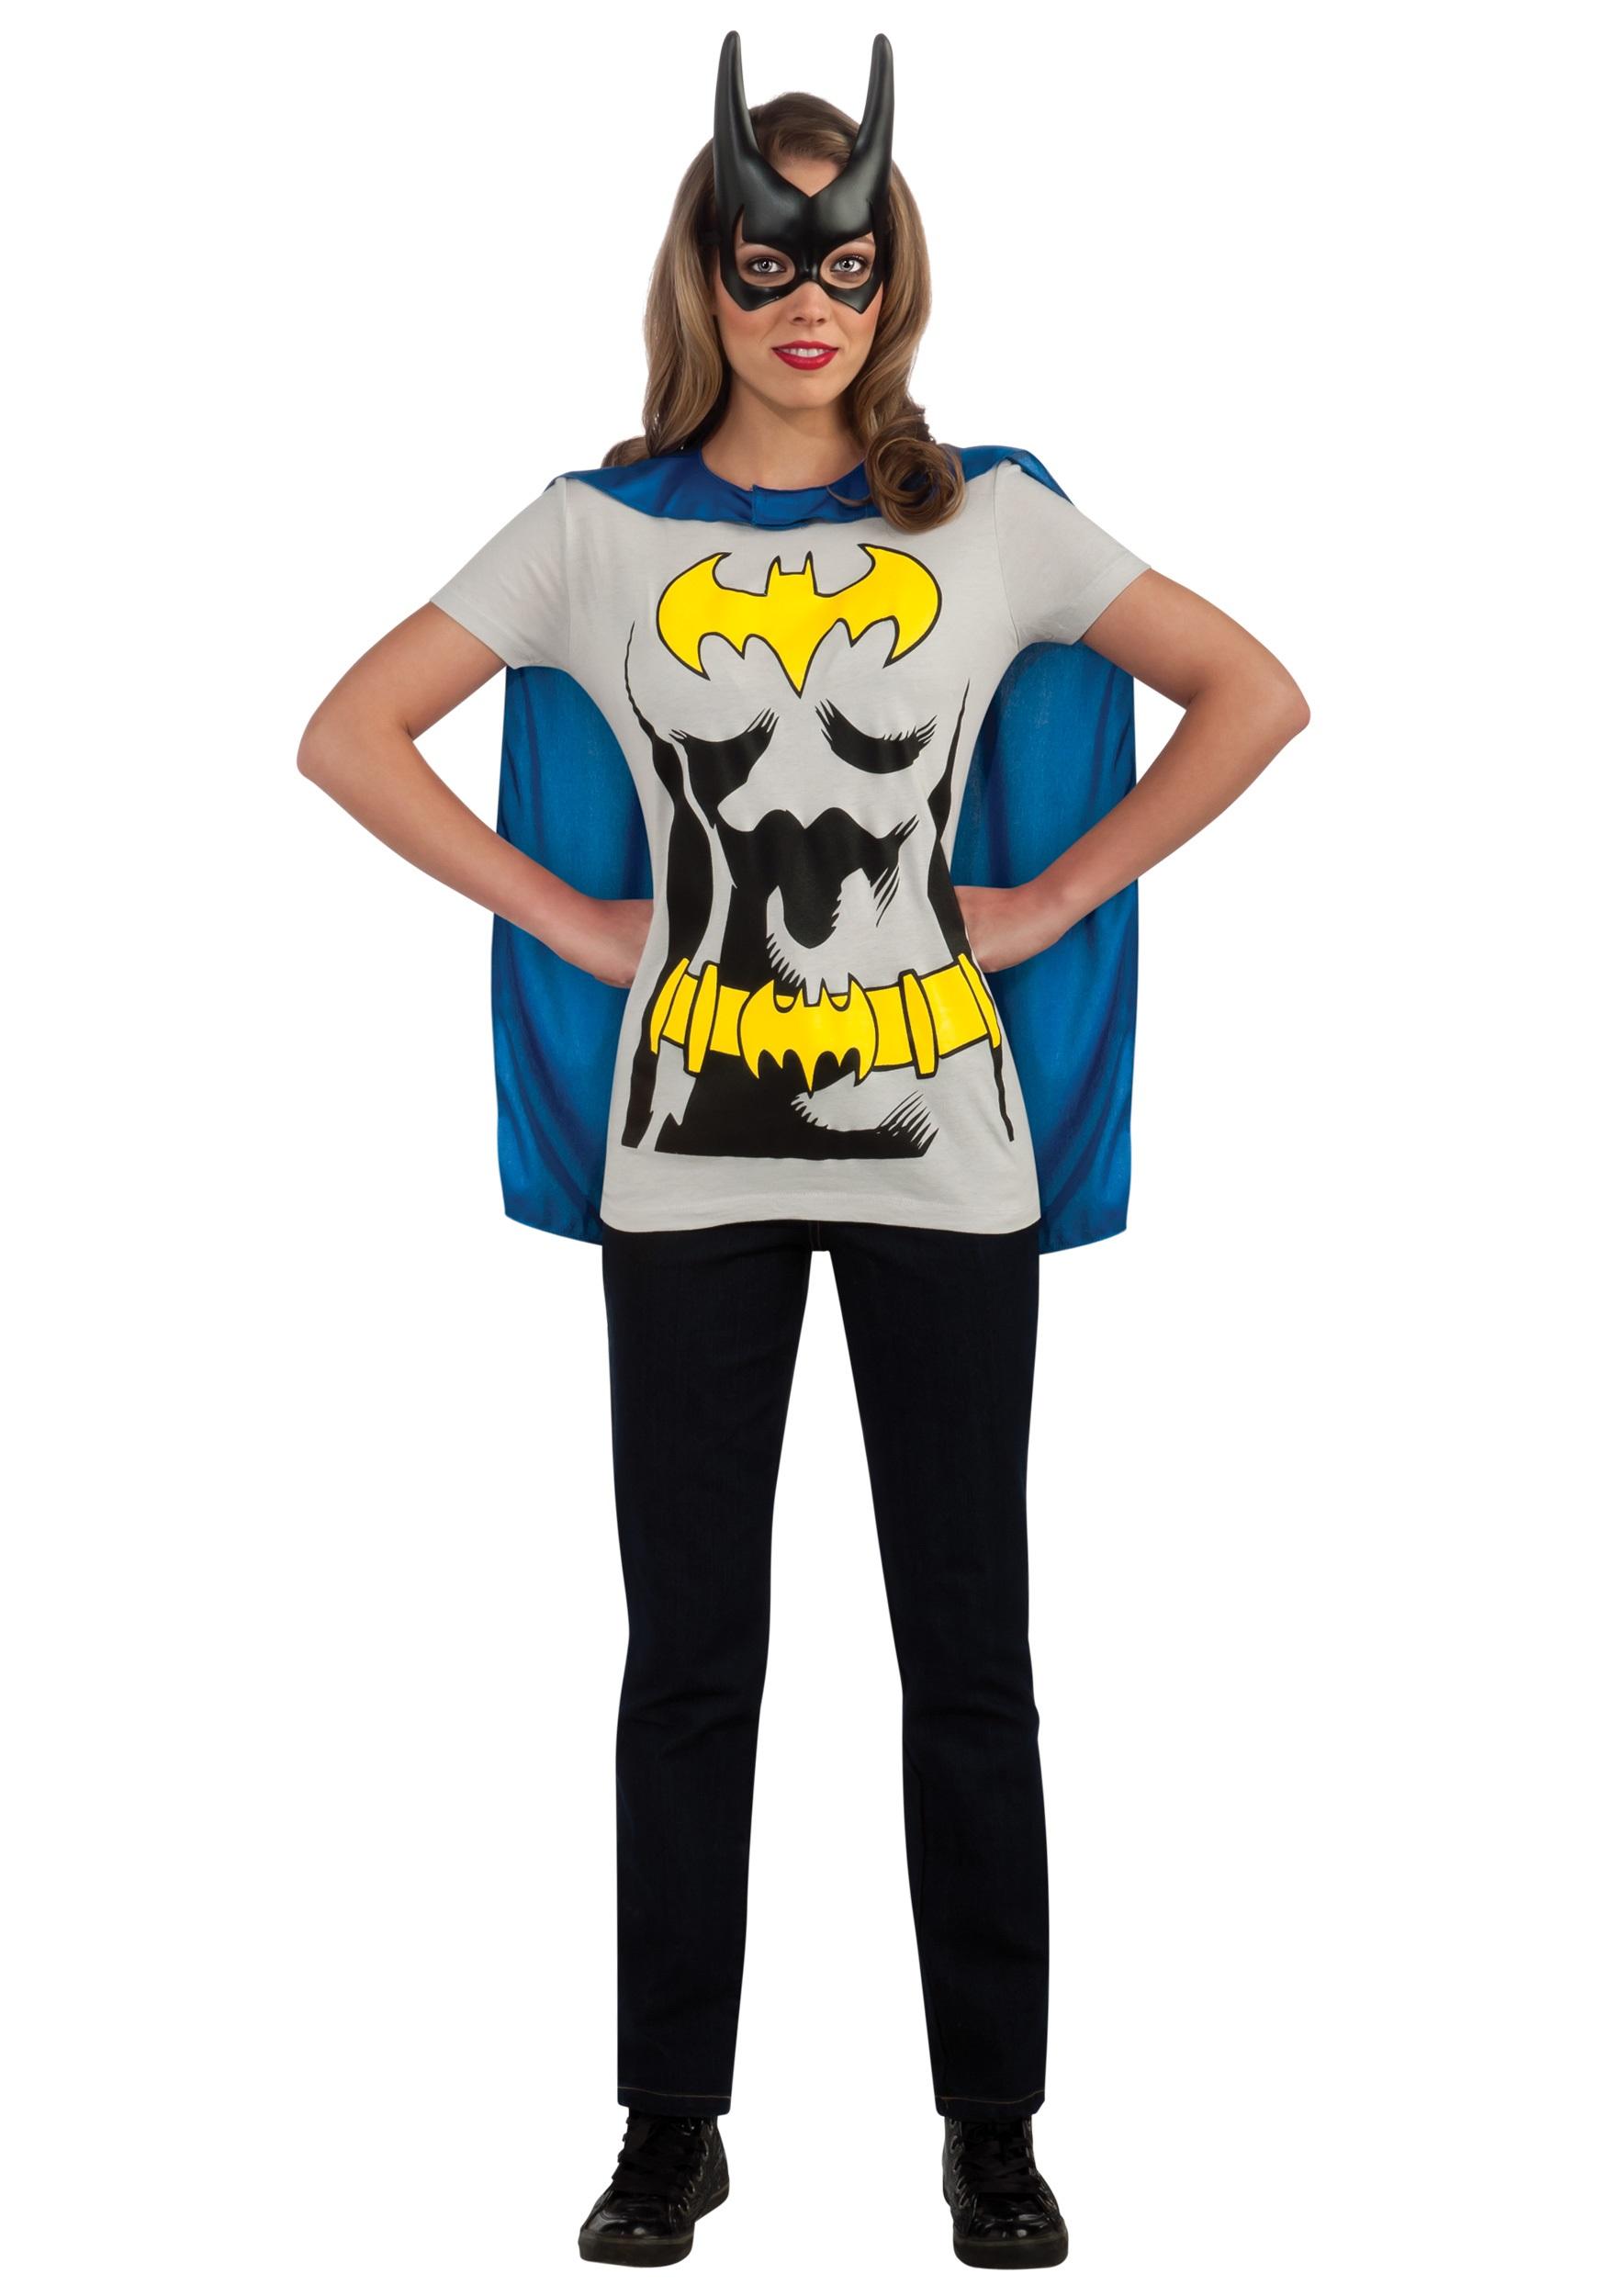 sc 1 st  Fun.com & Womens Batgirl T-Shirt with Cape Costume